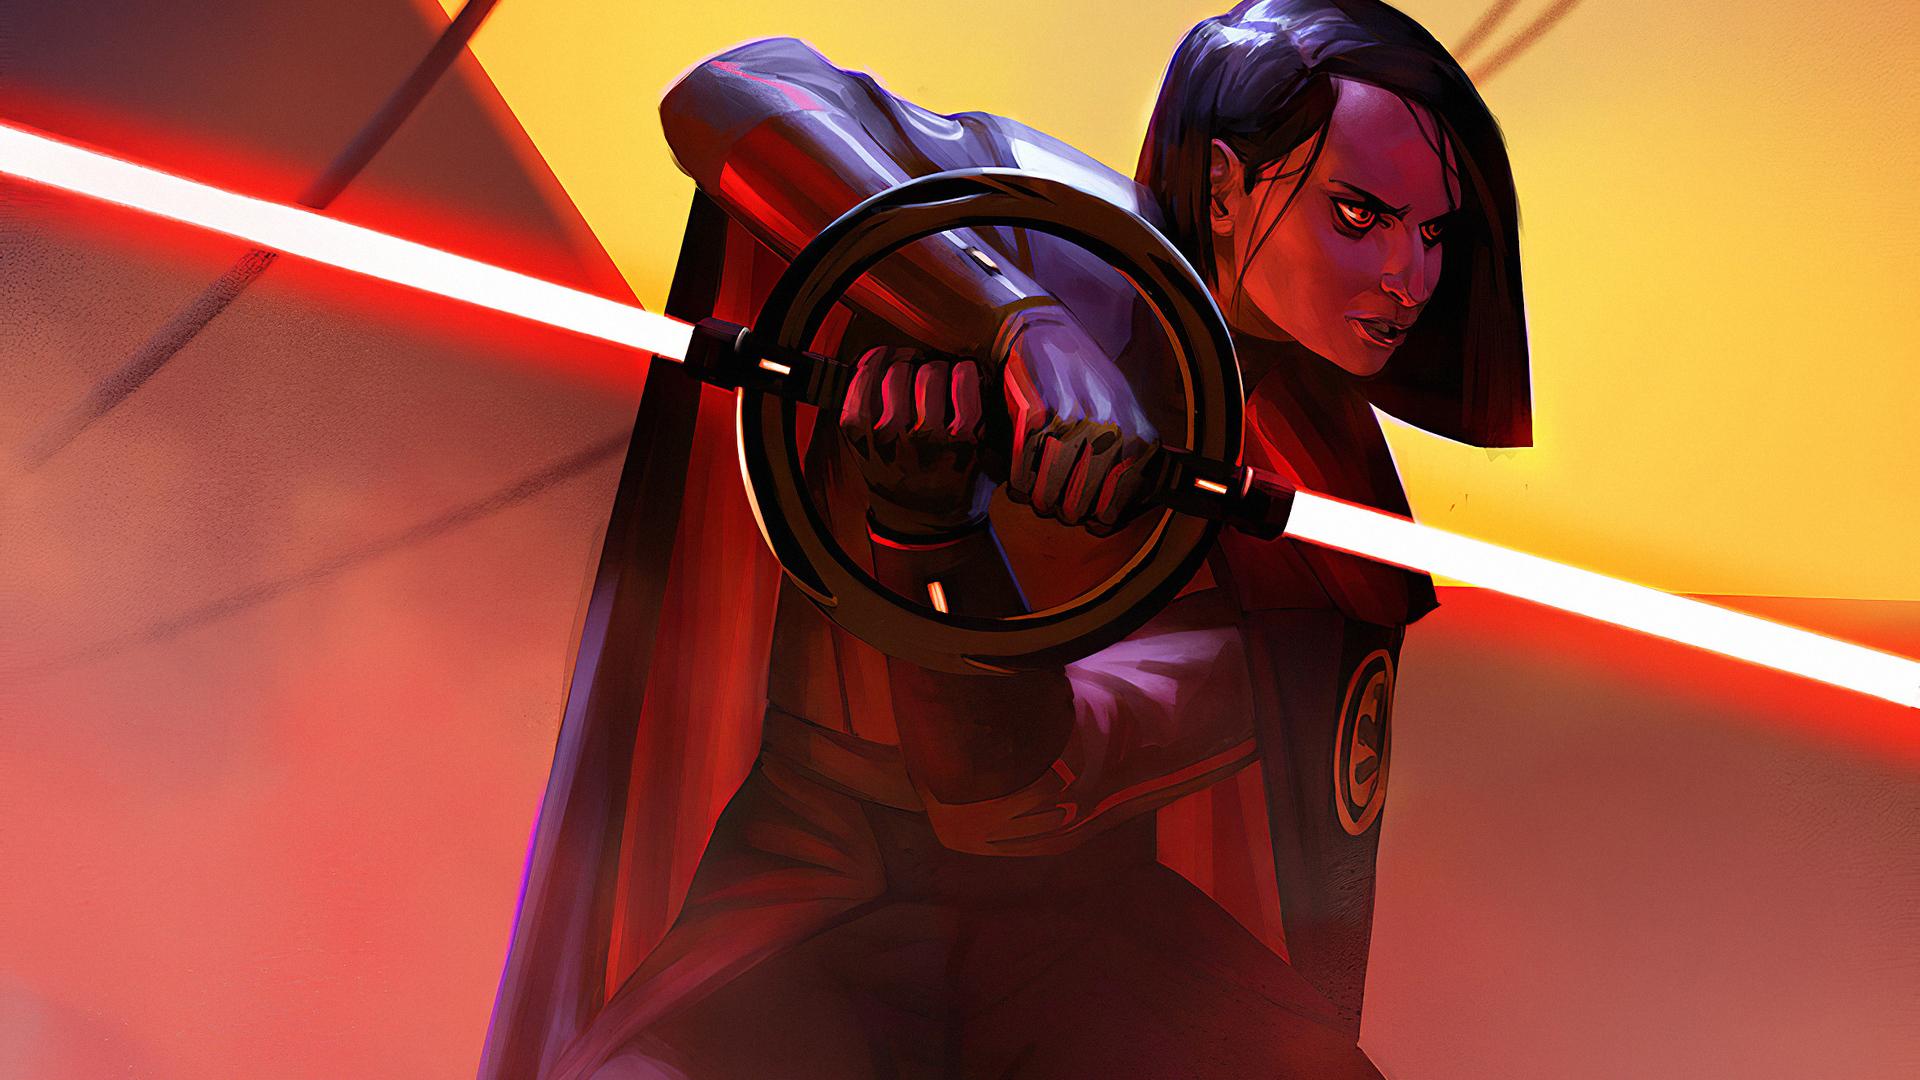 rey-red-lightsaber-hr.jpg